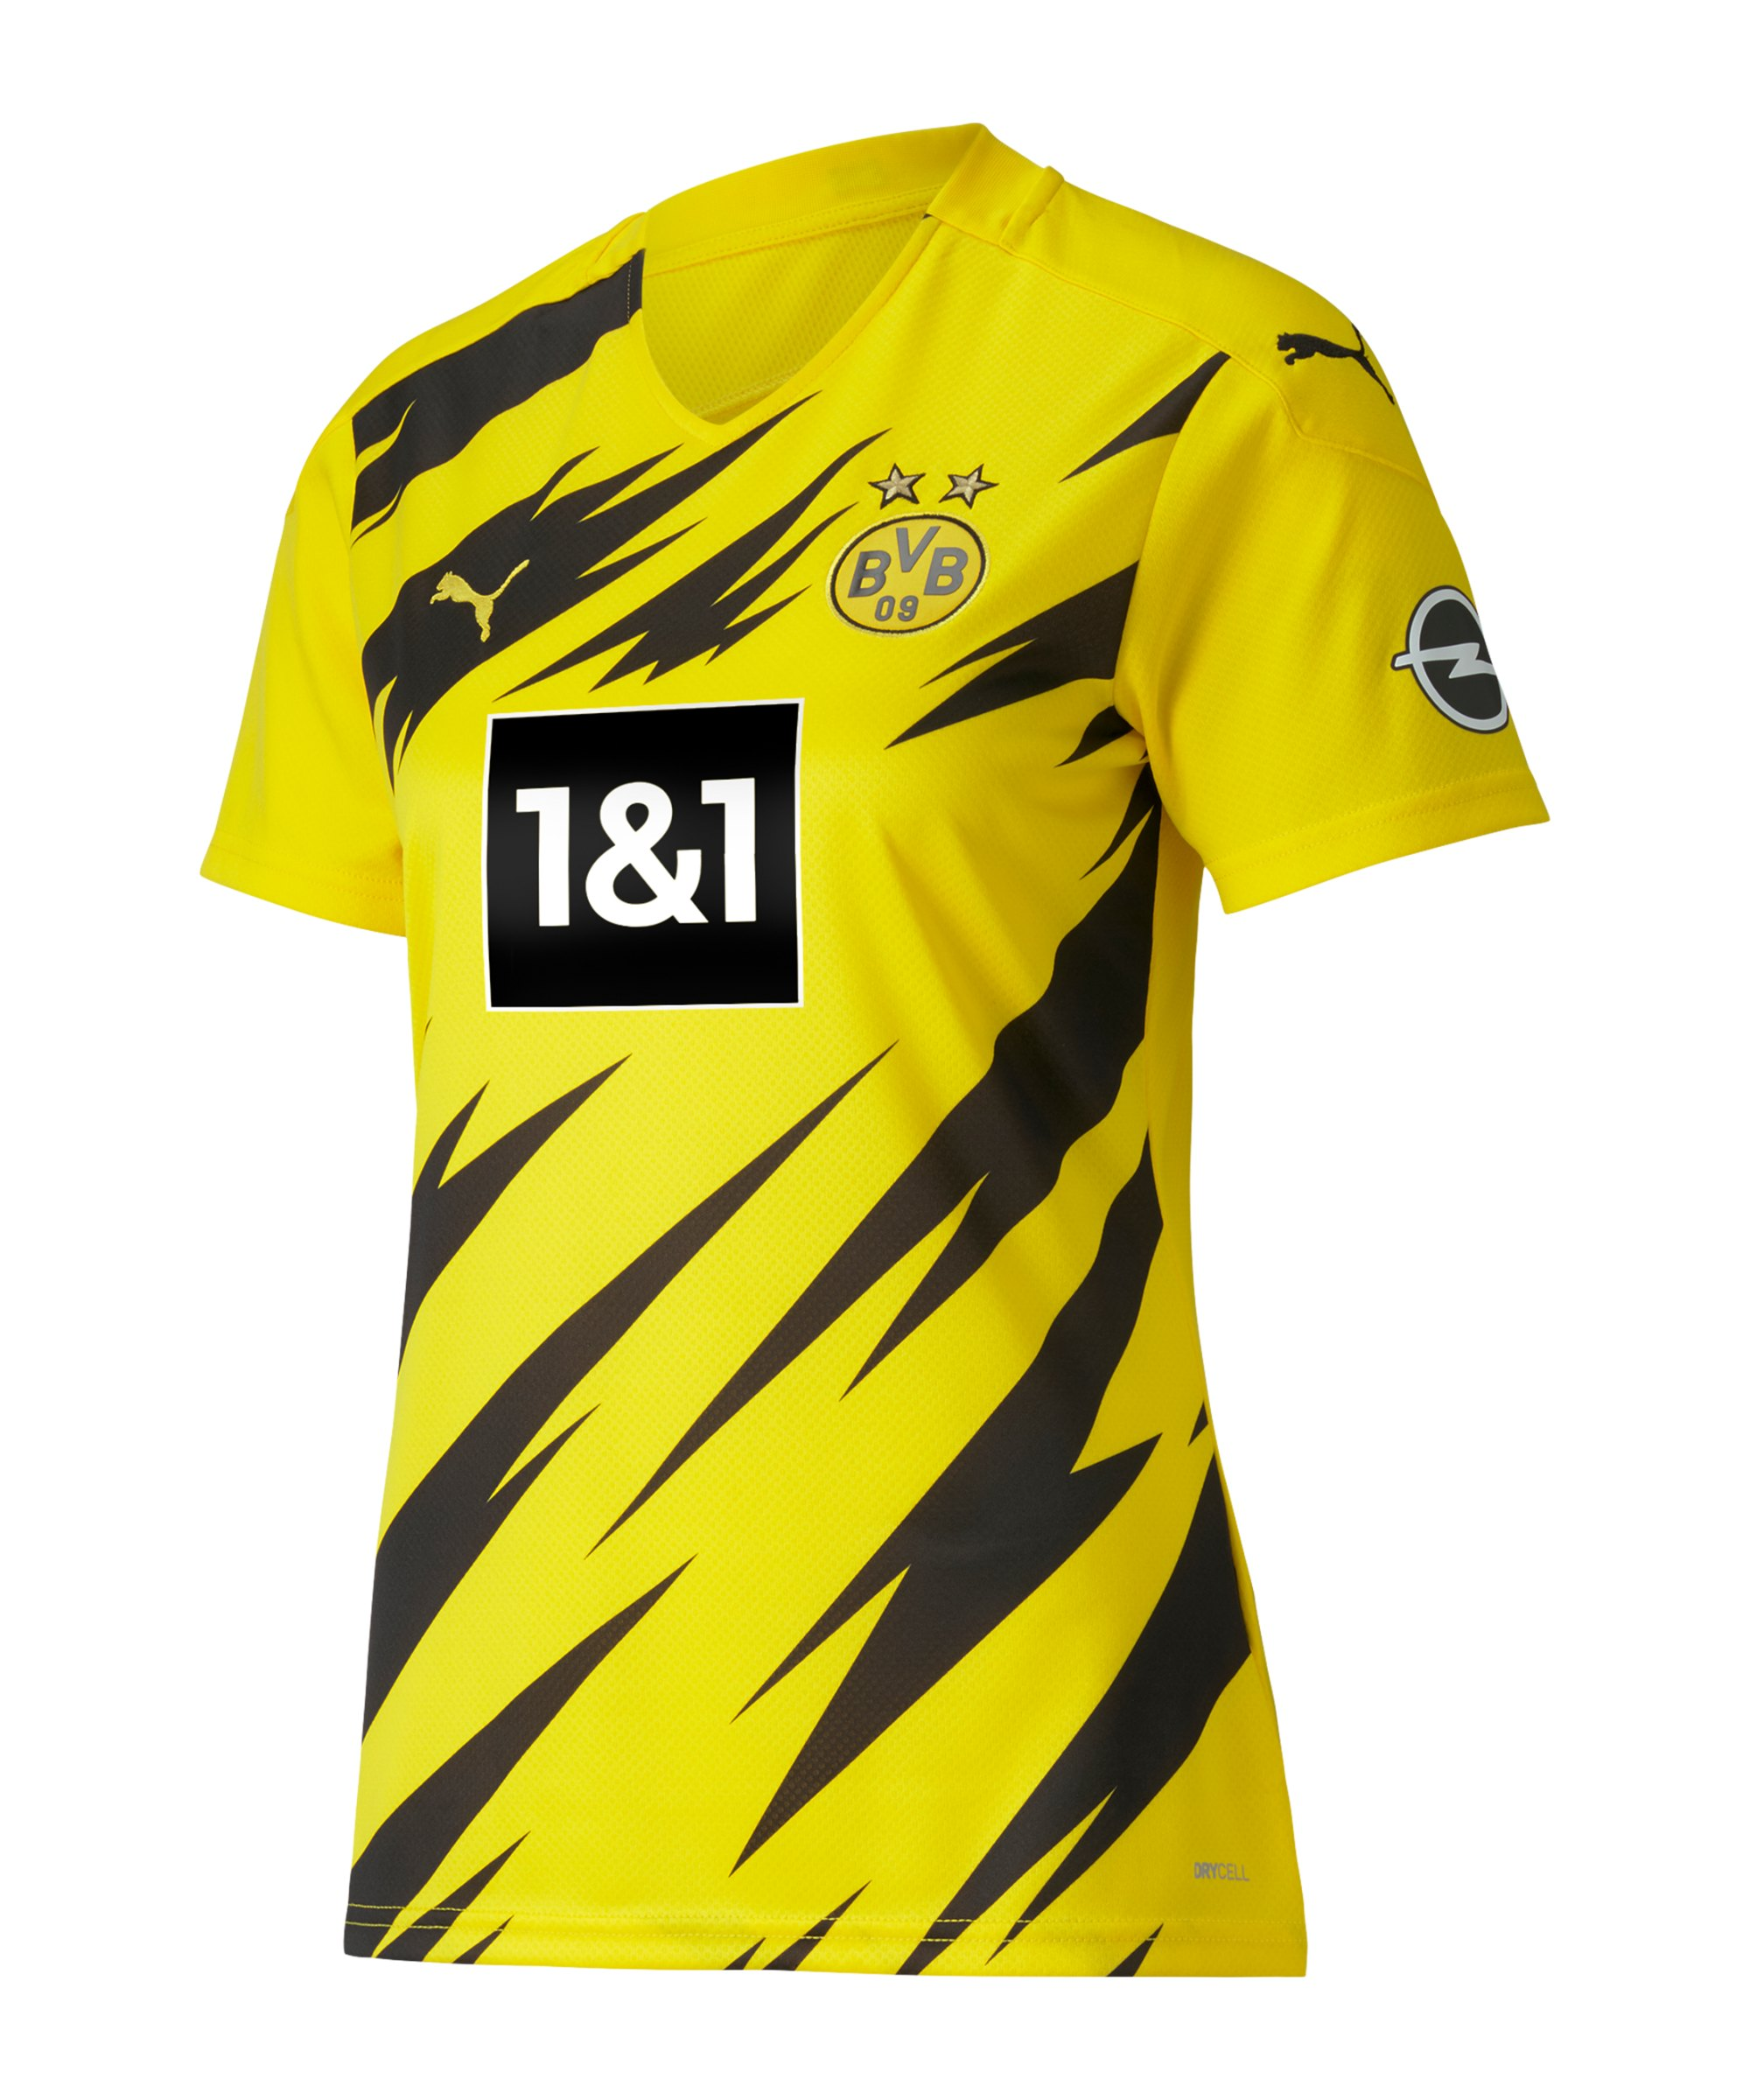 PUMA BVB Dortmund Trikot Home 2020/2021 Damen Gelb F01 - gelb